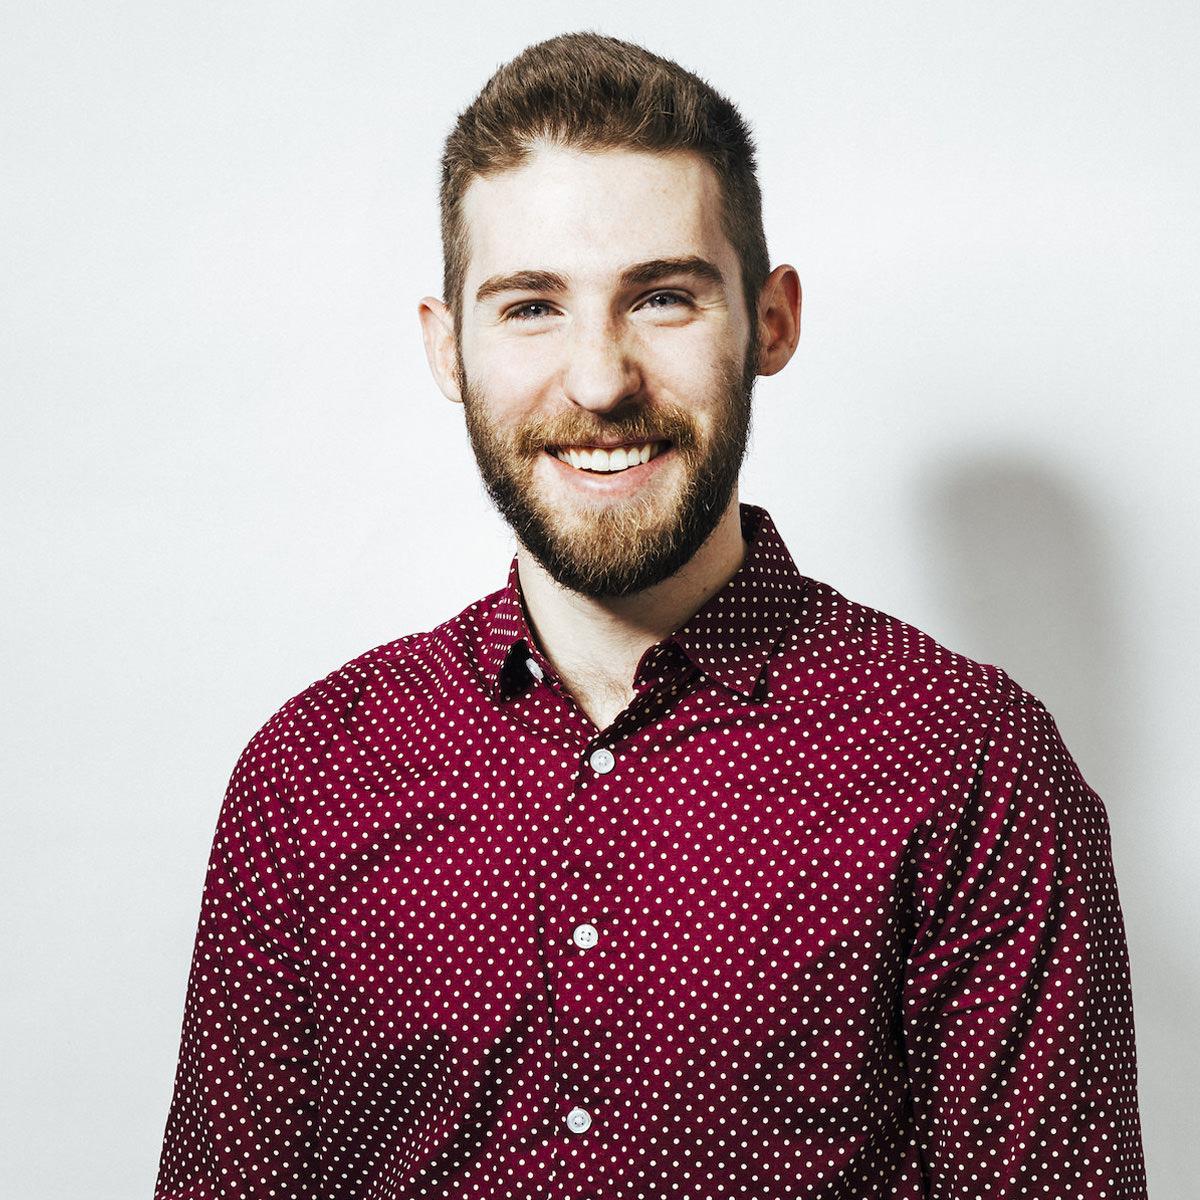 ben-butler-founder